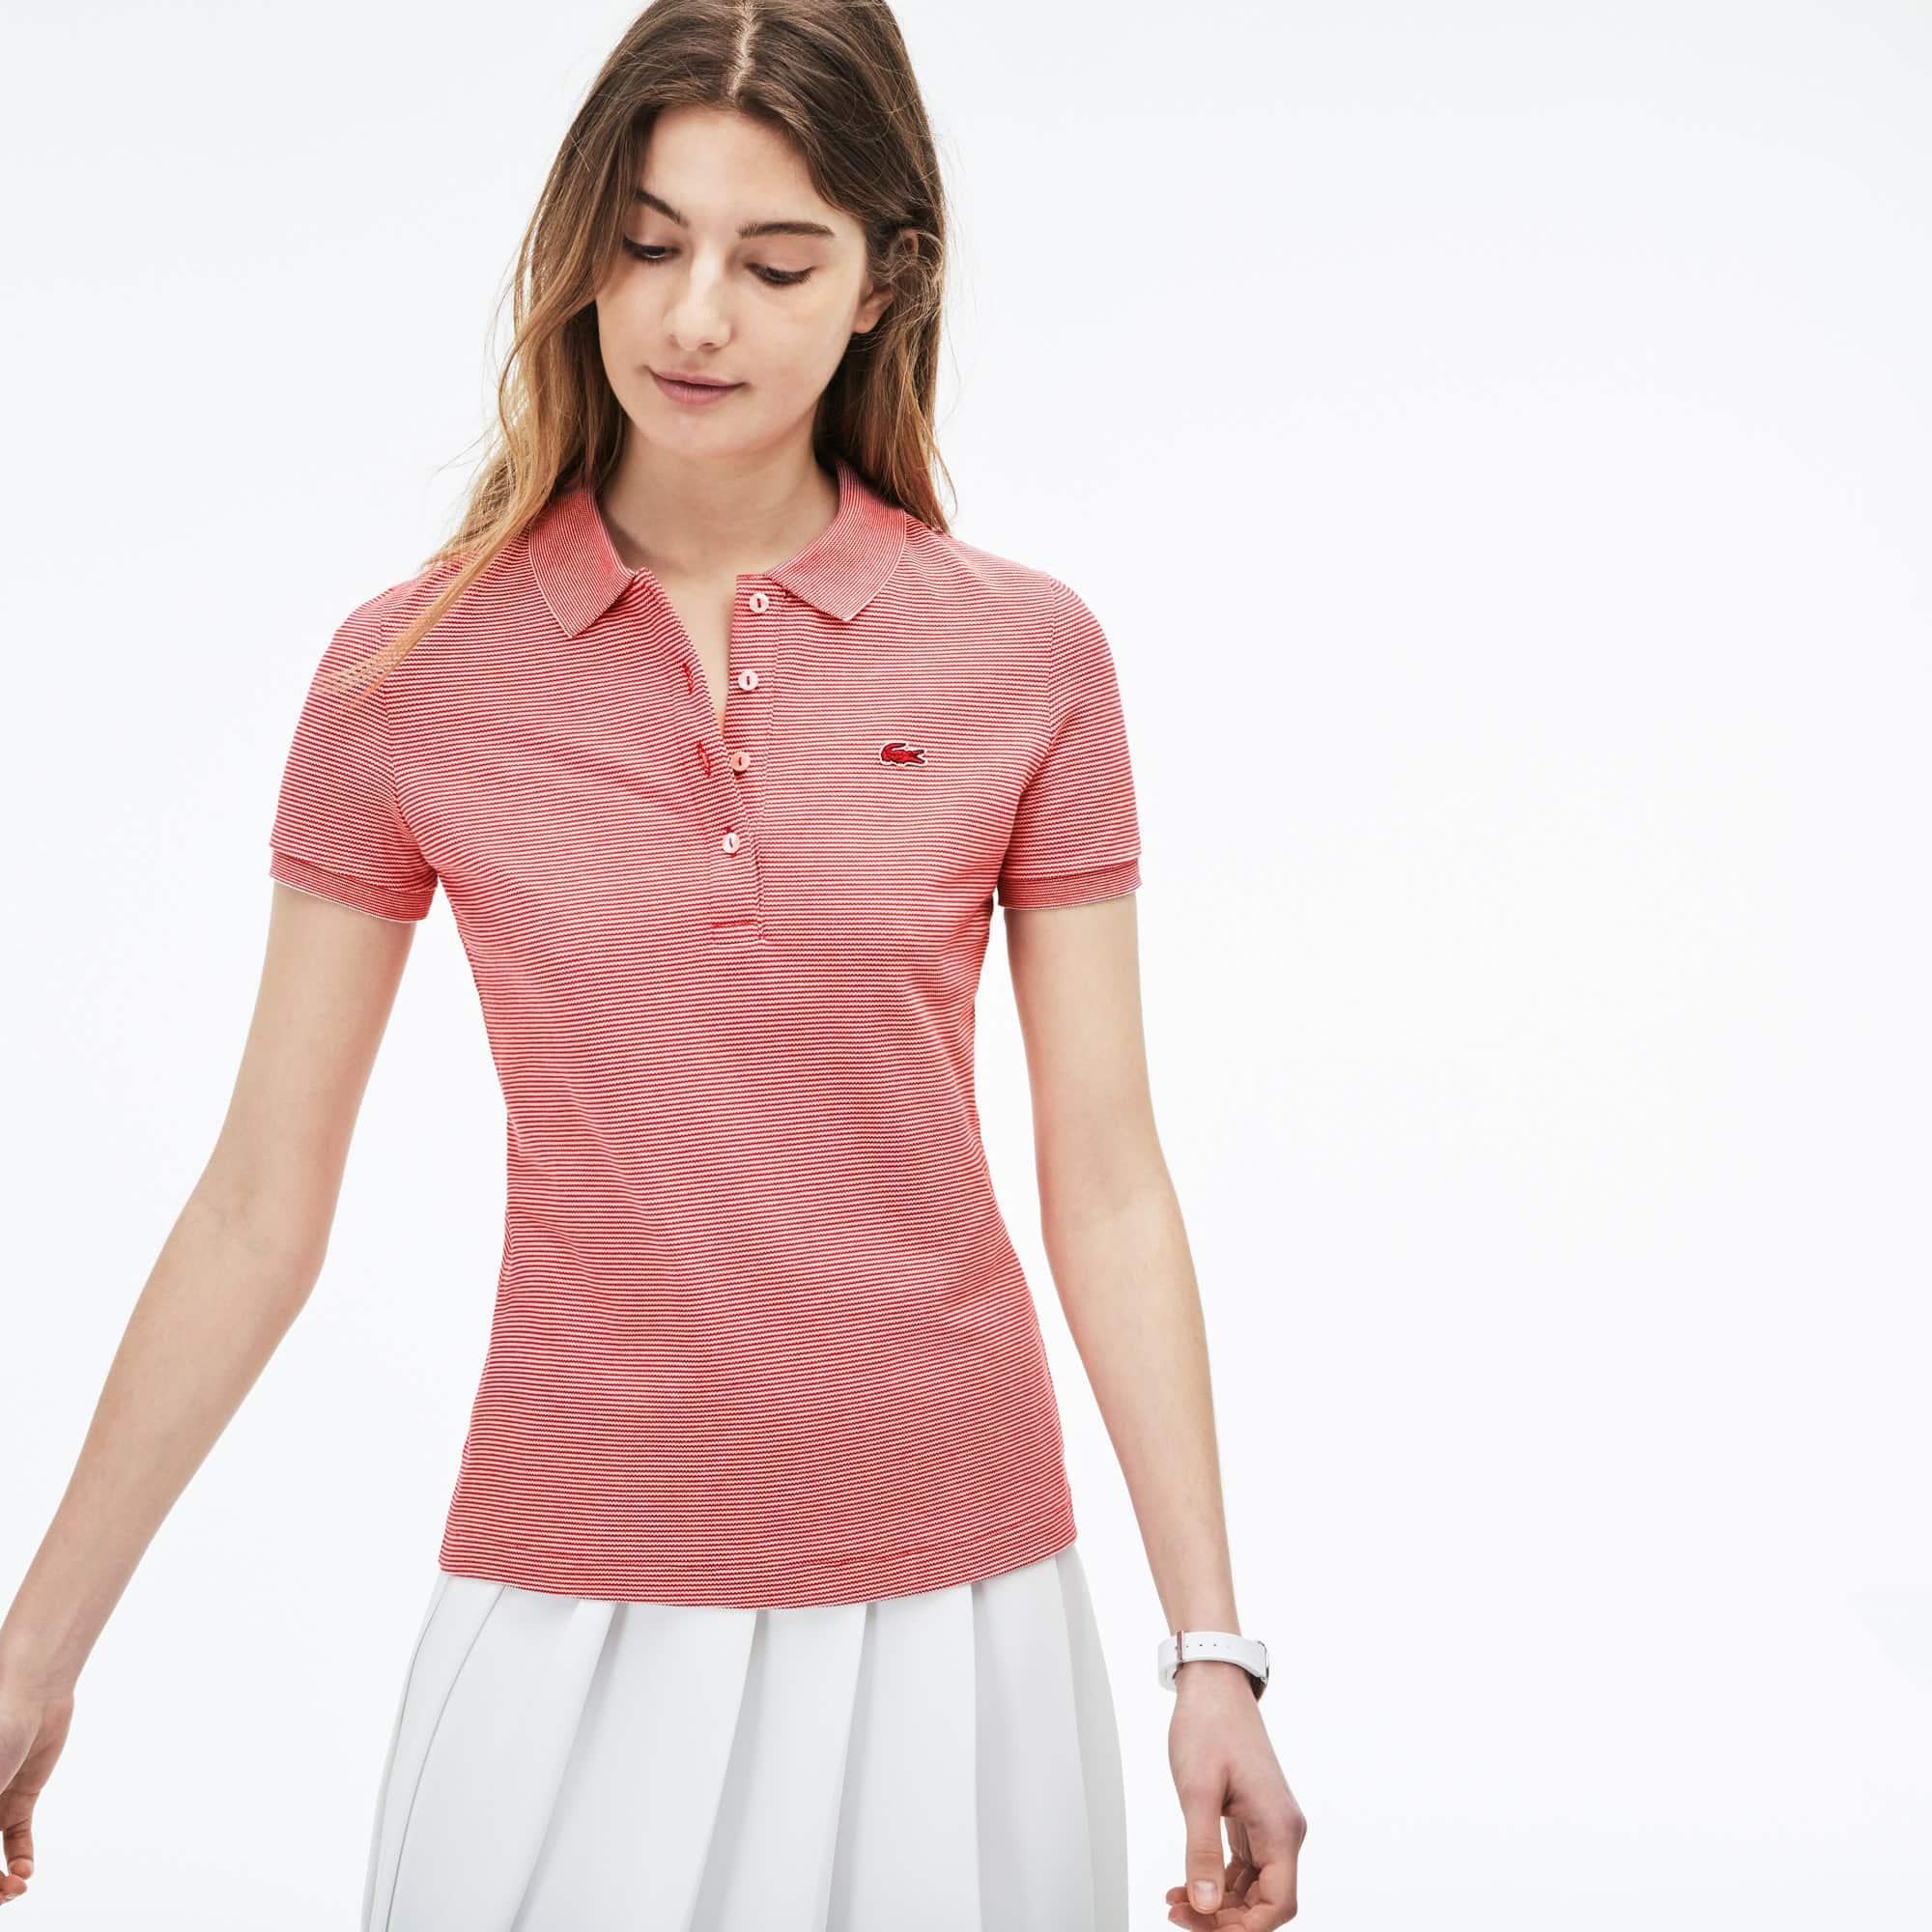 359c509981 Camisas polo